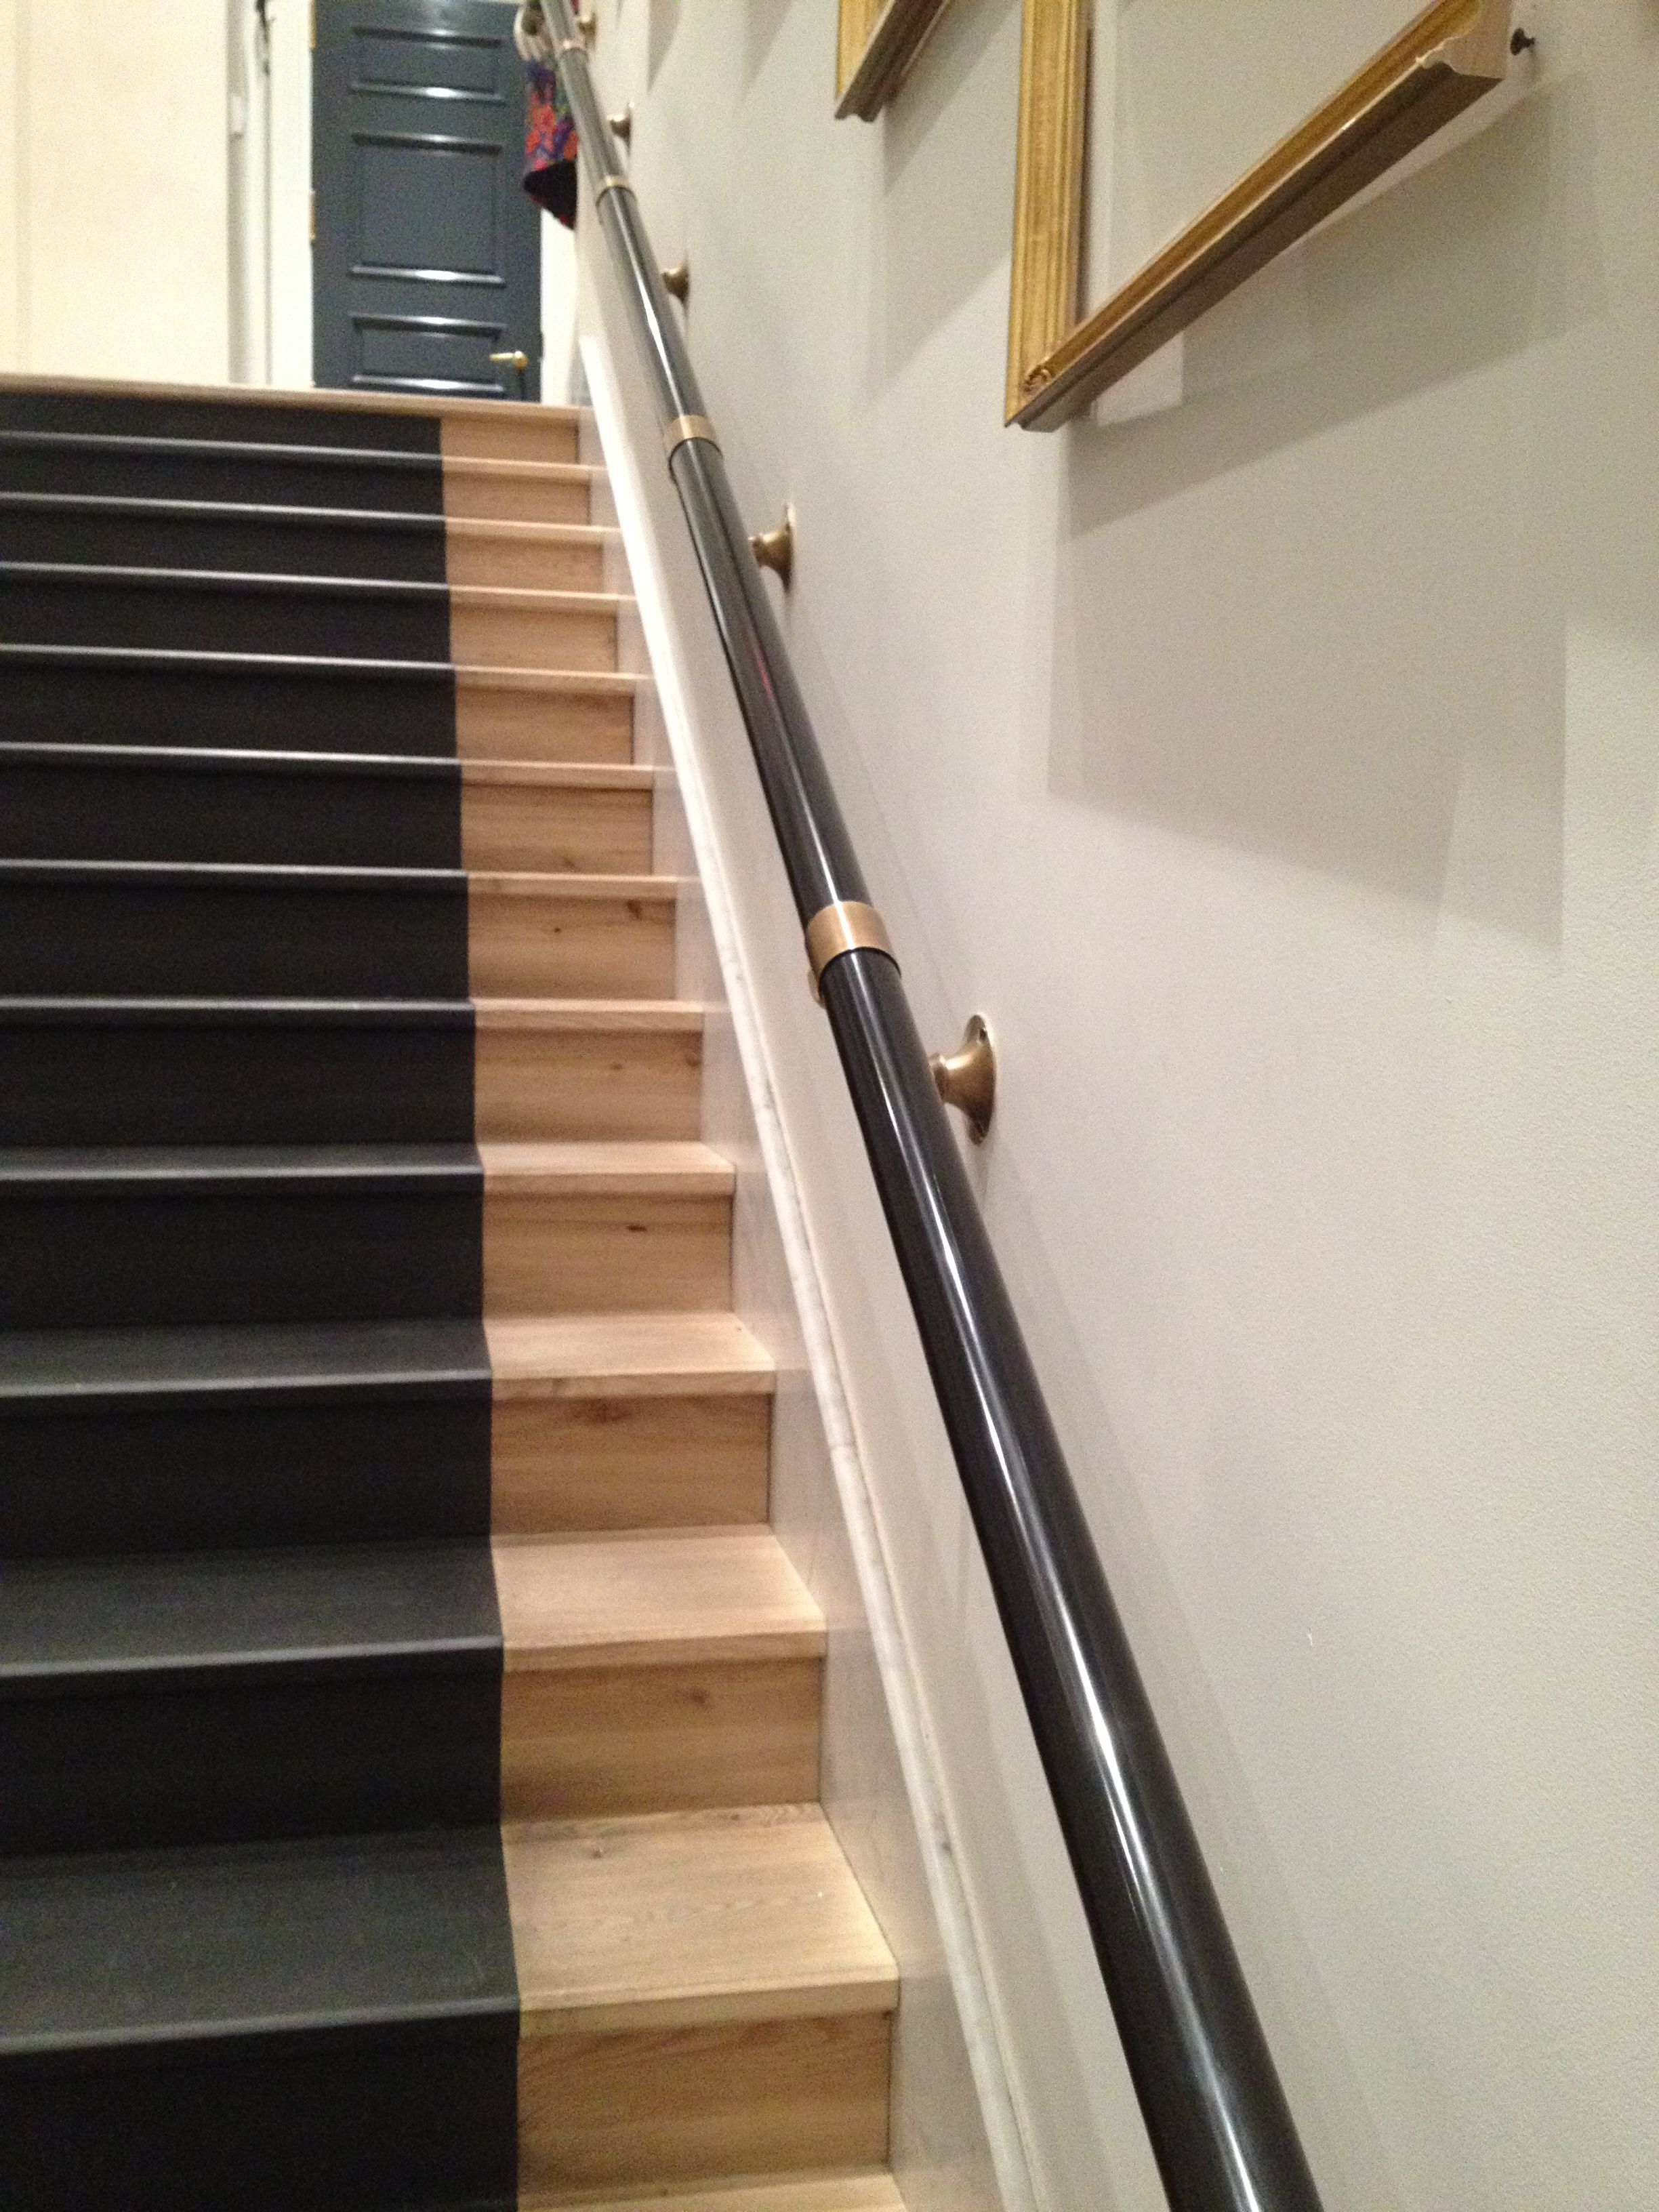 Best Brass Black Handrail At Jcrew Wedding Store Staircase 400 x 300